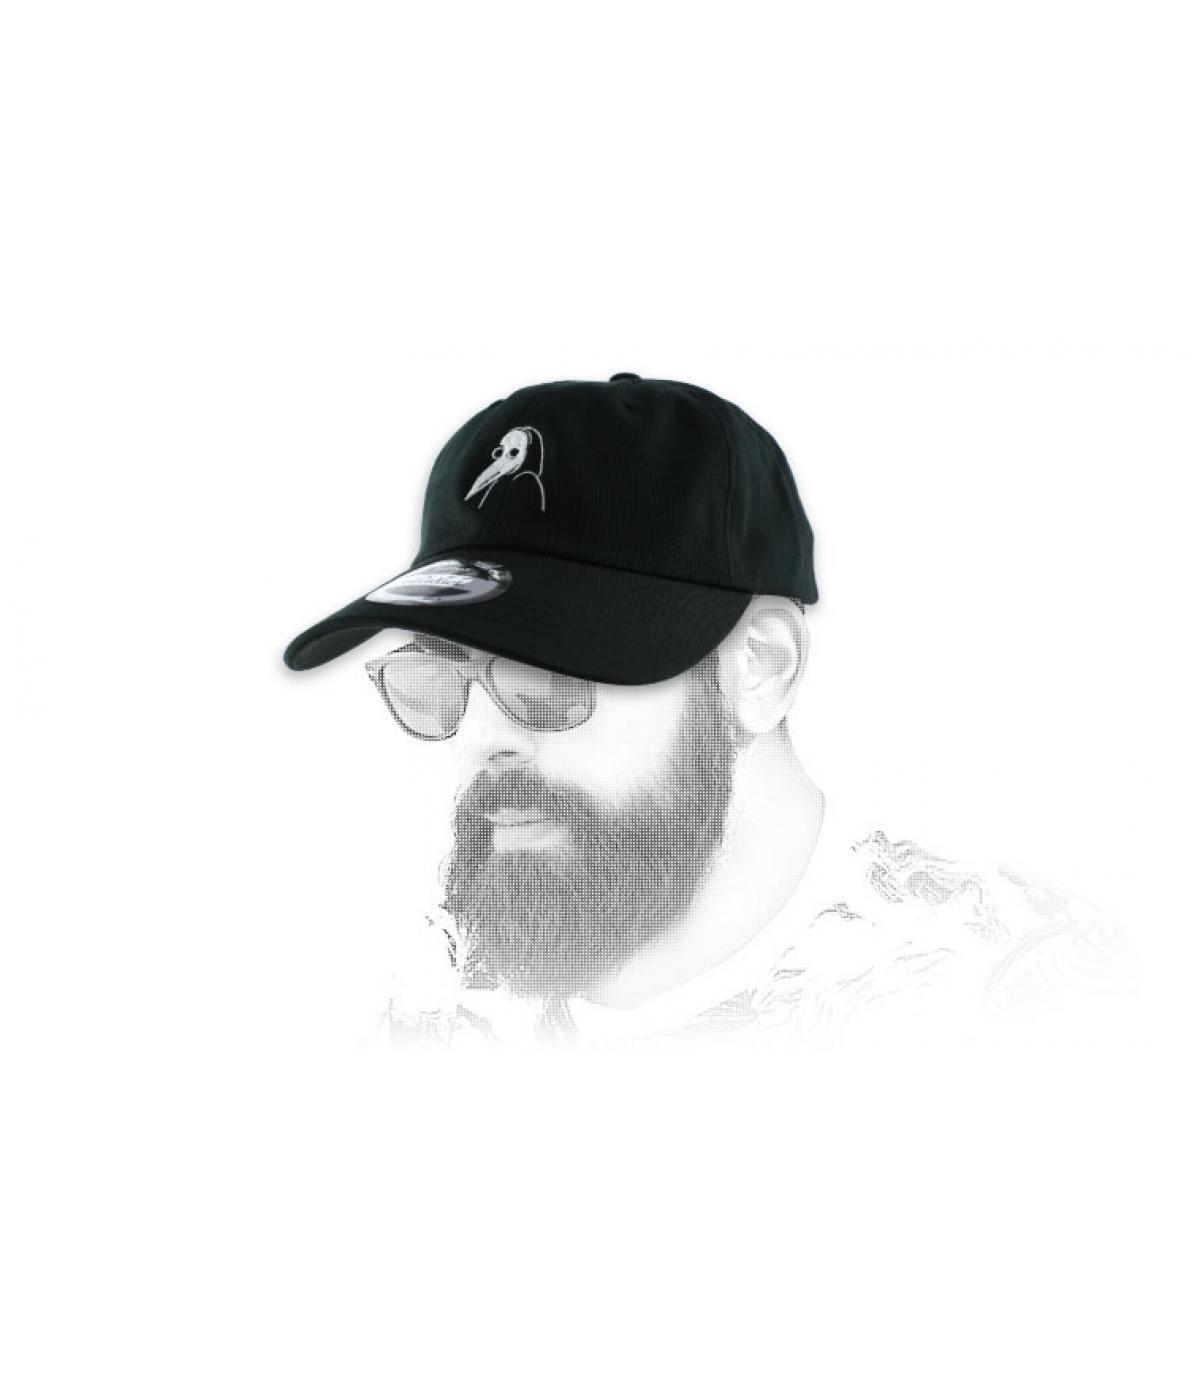 gorra curva de máscara plaga